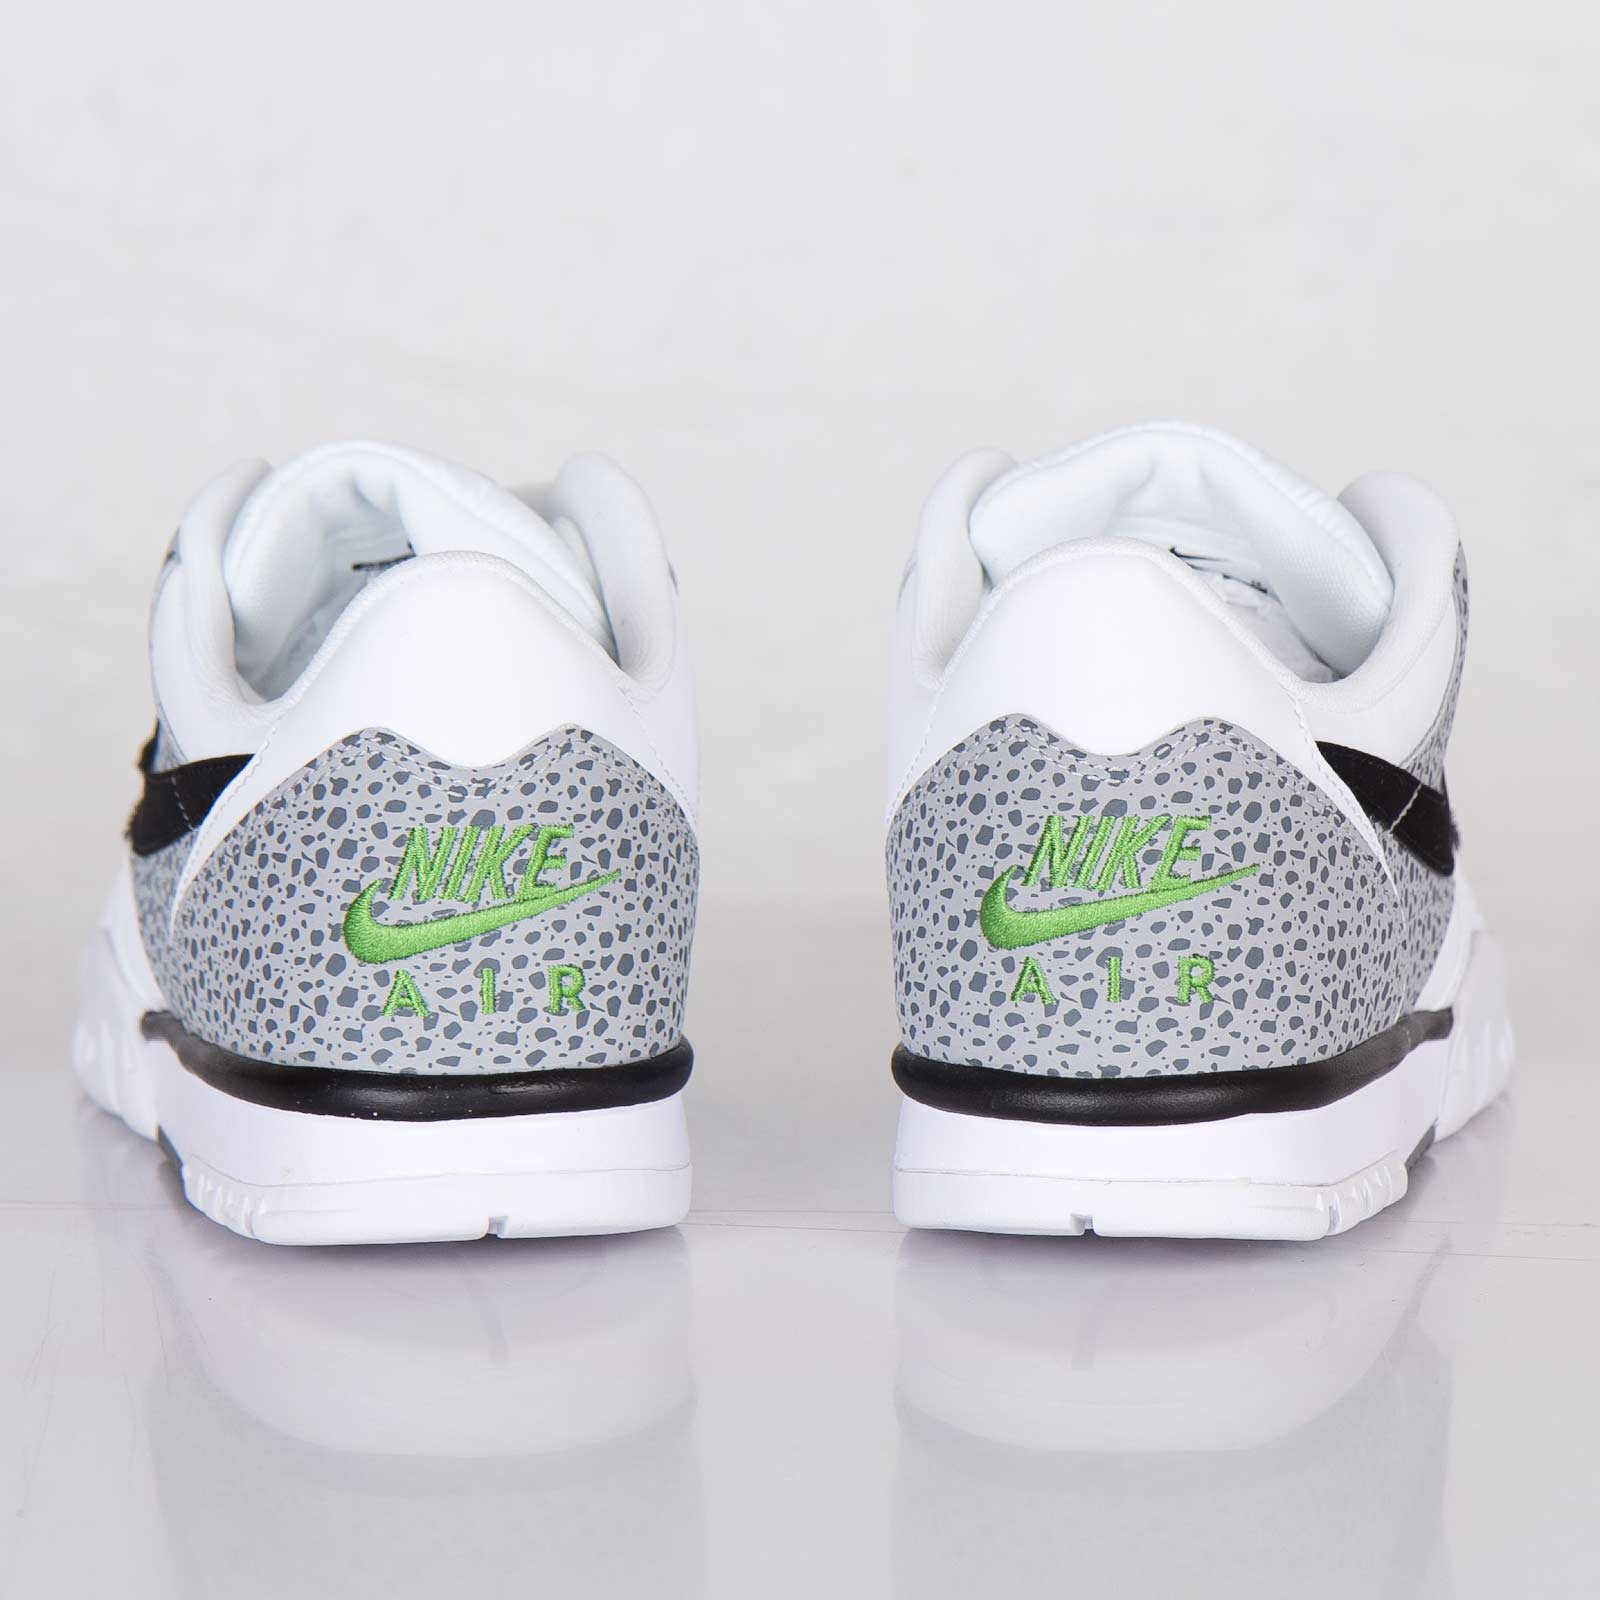 differently 8ddf3 d4517 Nike Air Trainer 1 Low St - 637995-100 - Sneakersnstuff   sneakers   streetwear  online since 1999